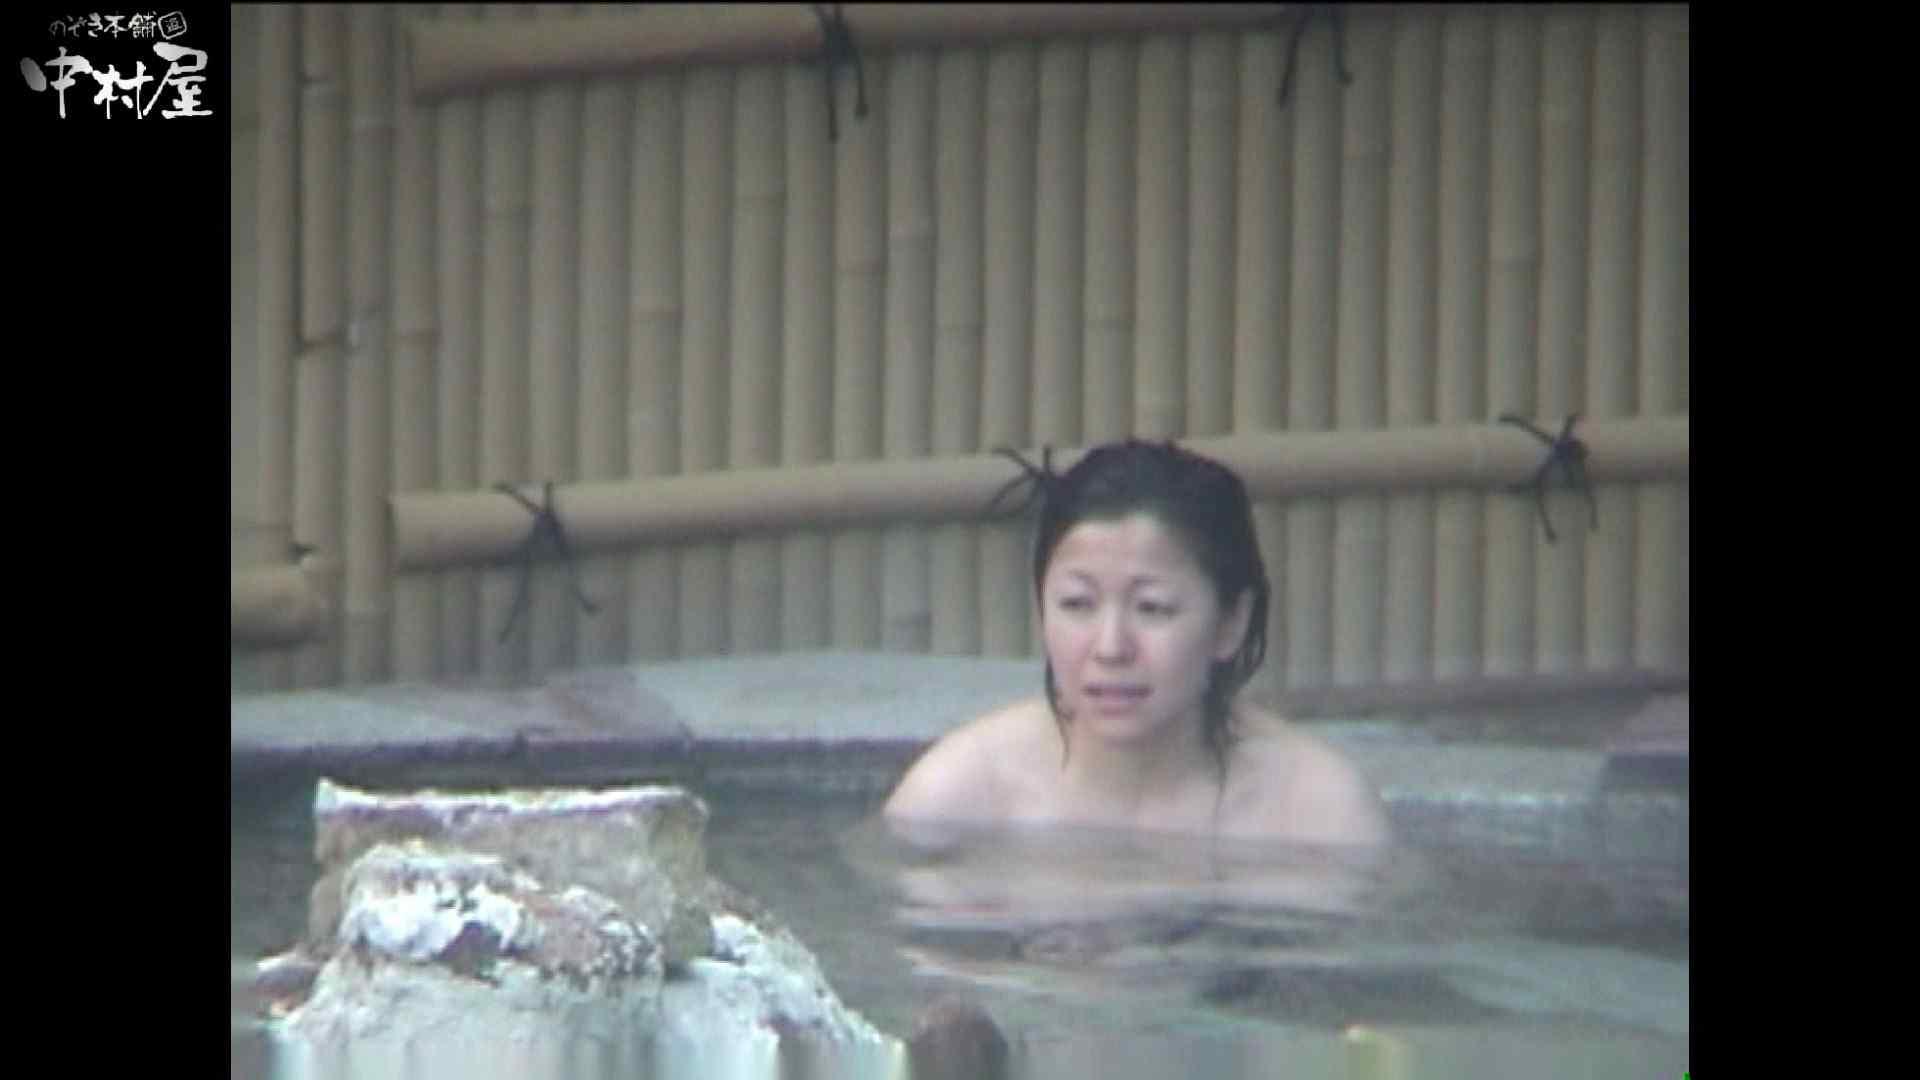 Aquaな露天風呂Vol.986 盗撮  94連発 1